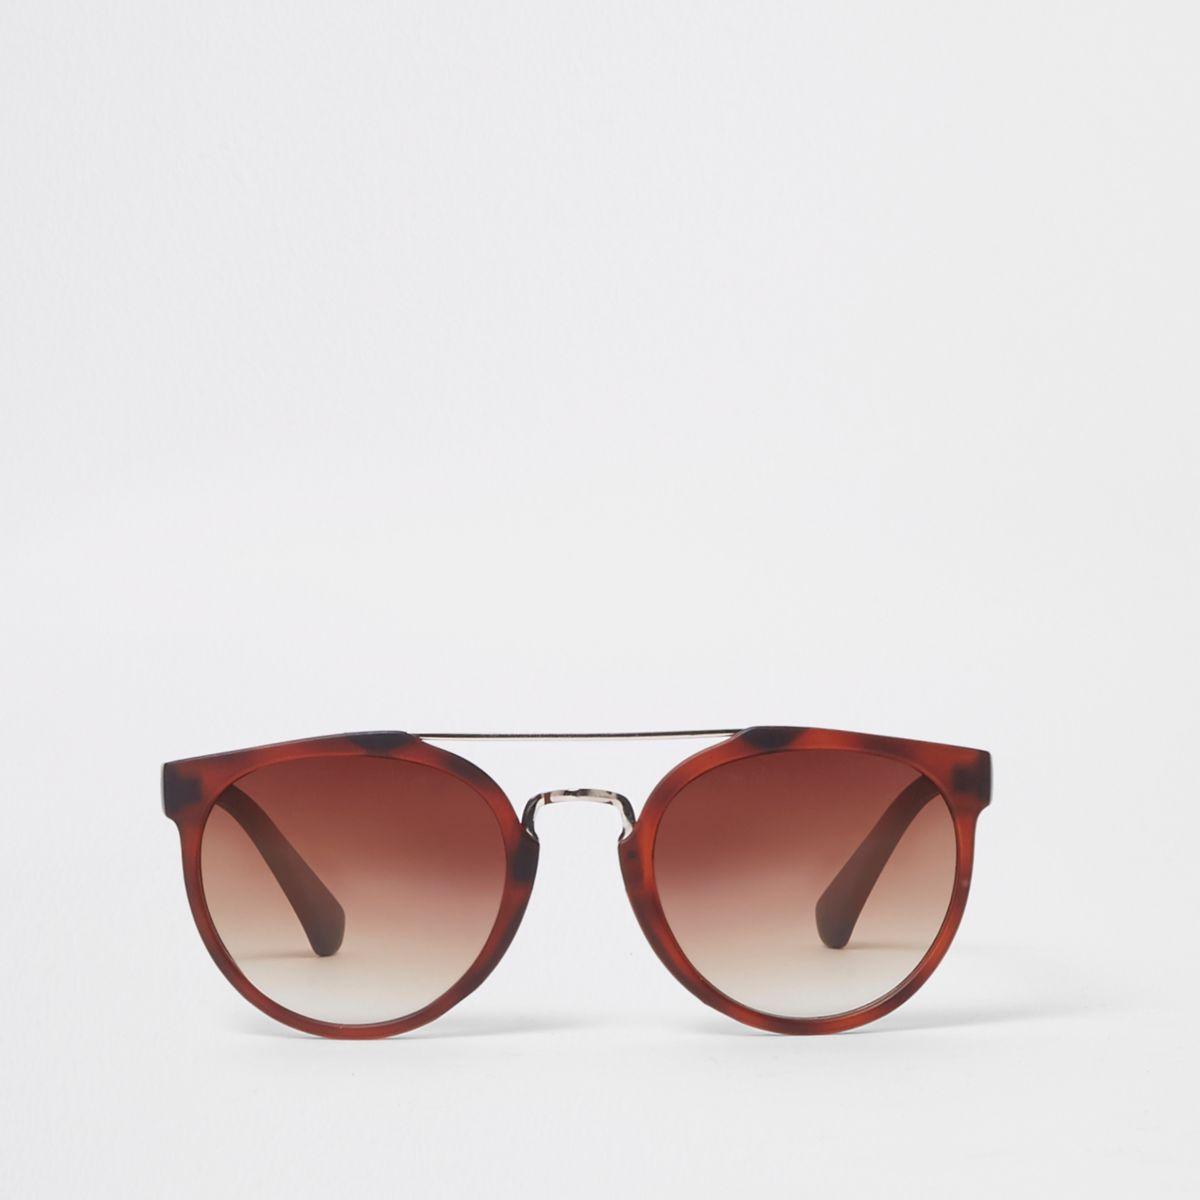 Boys brown aviator sunglasses